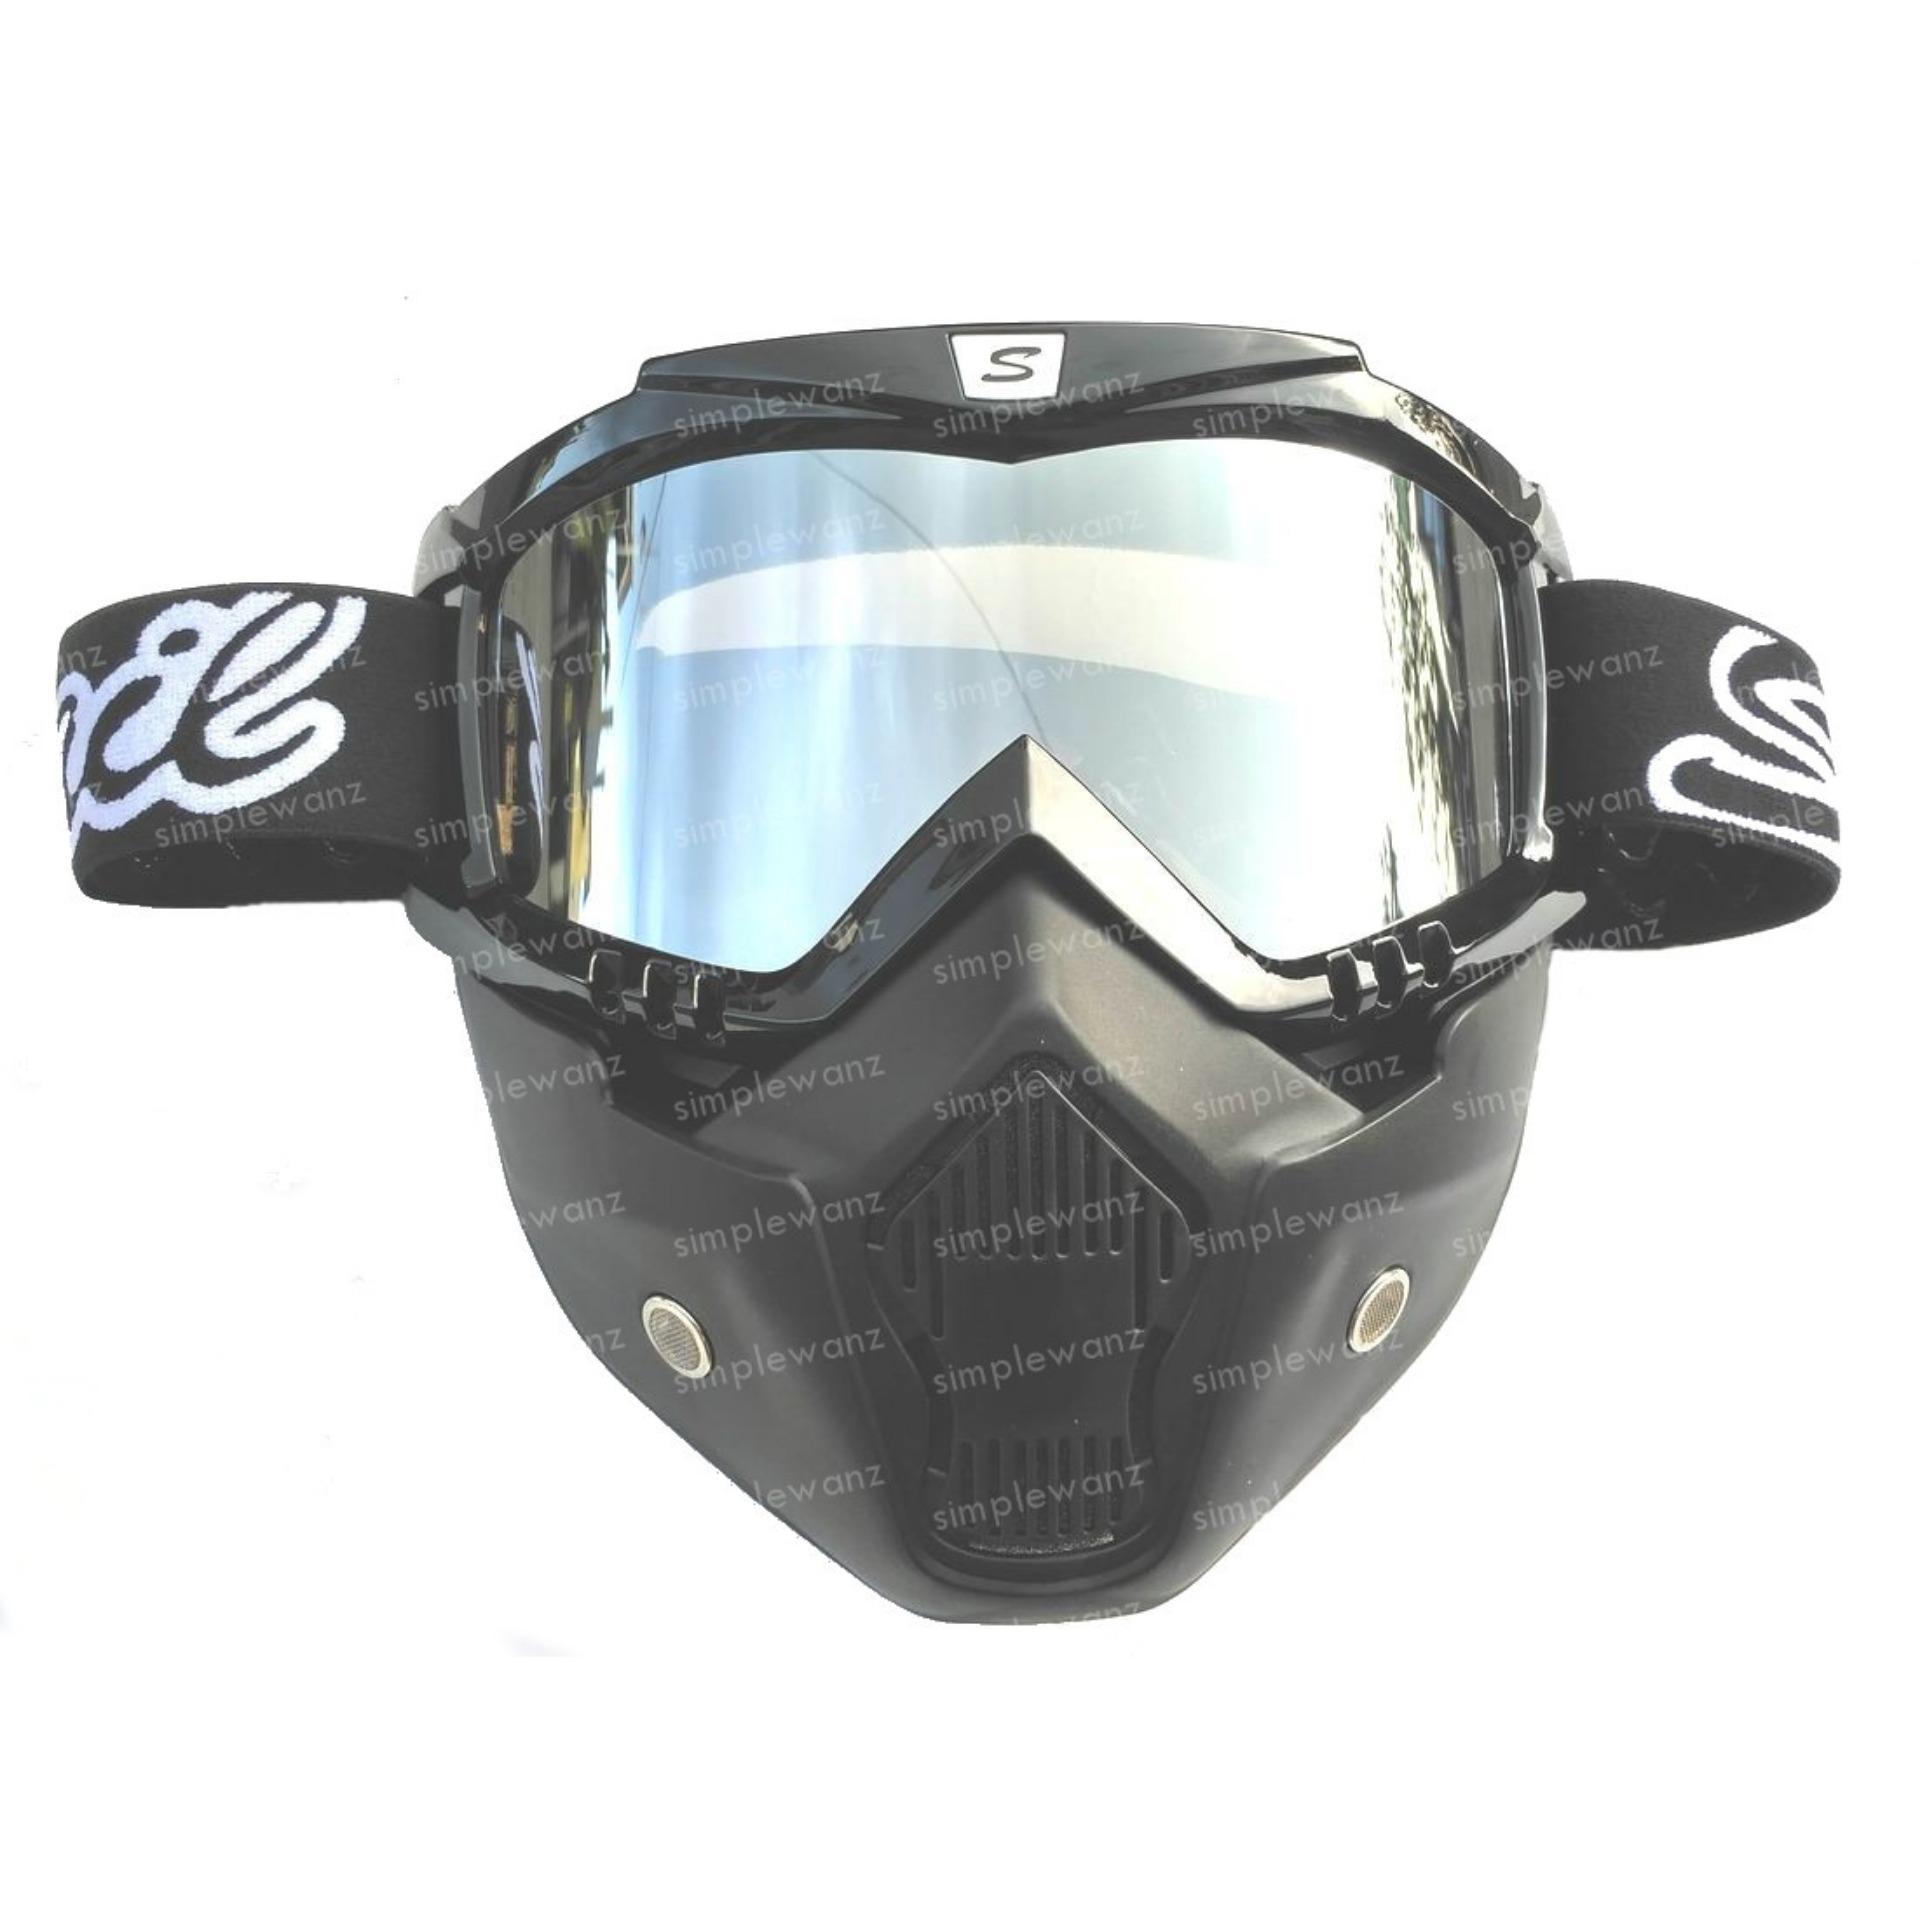 Diskon Goggle Alien Snail M20 Shark Mask Modular Google Mx20 Masker Topeng Silver Mirror Lens Indonesia